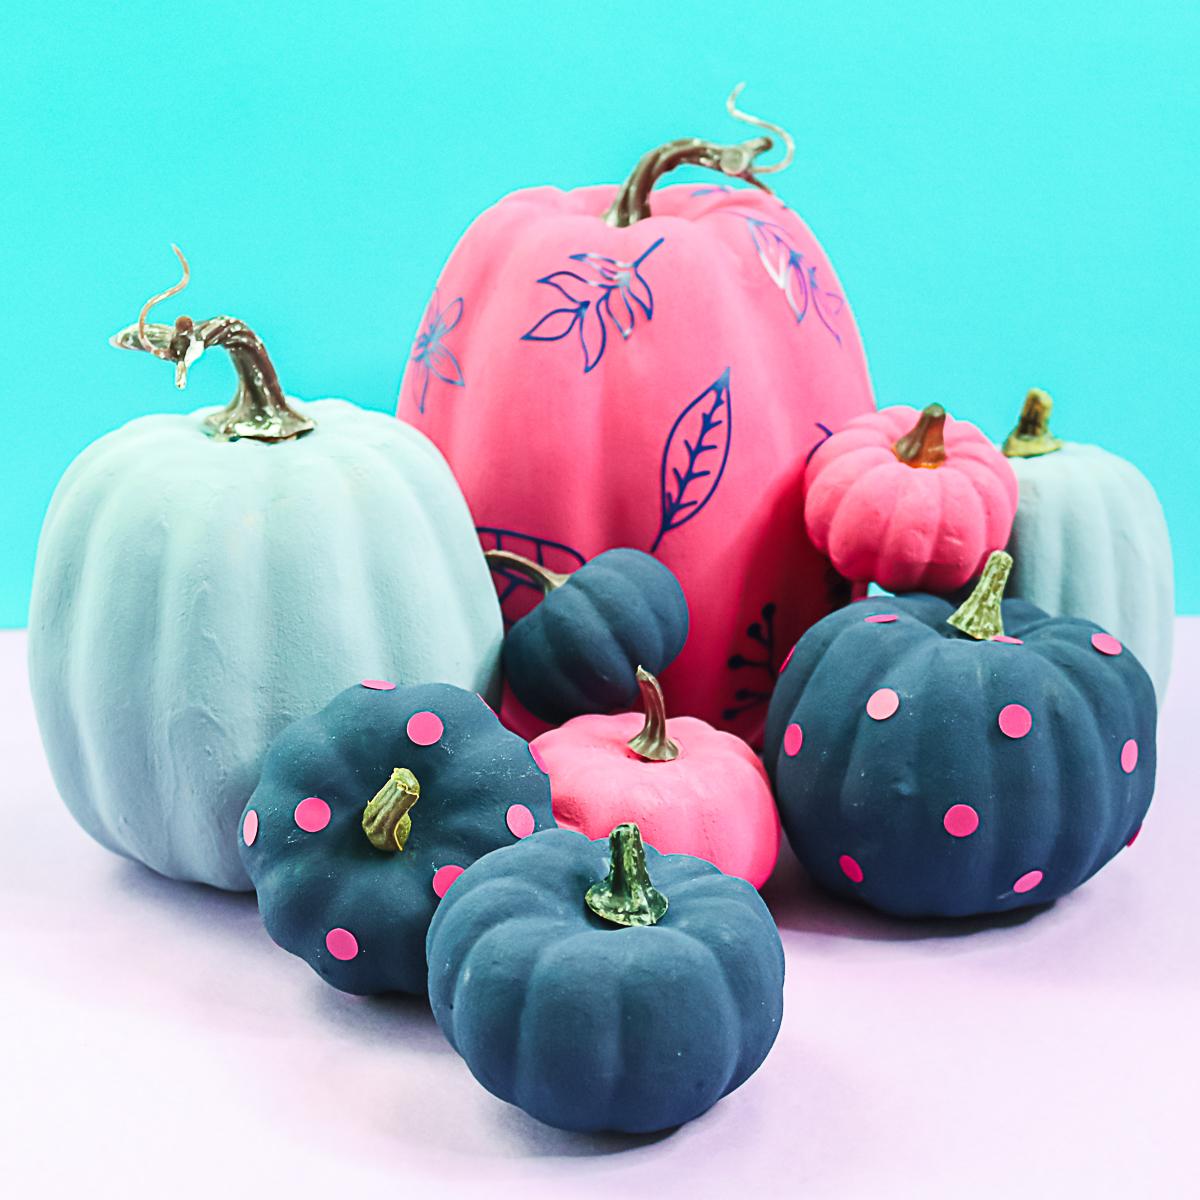 baking soda and acrylic paint on pumpkins